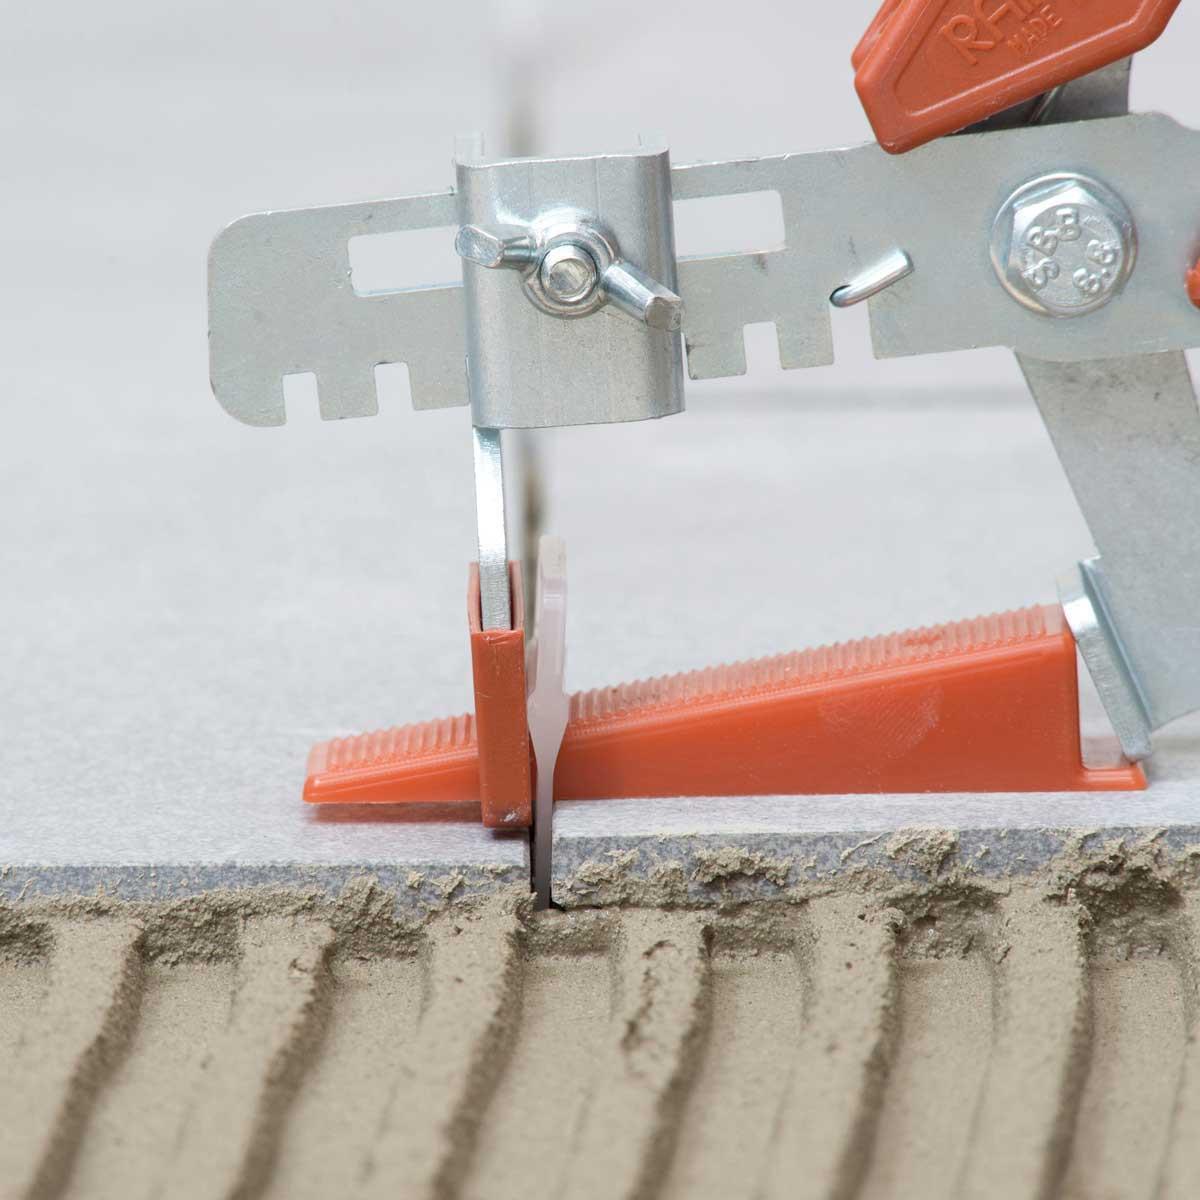 raimondi wedge installation with pliers